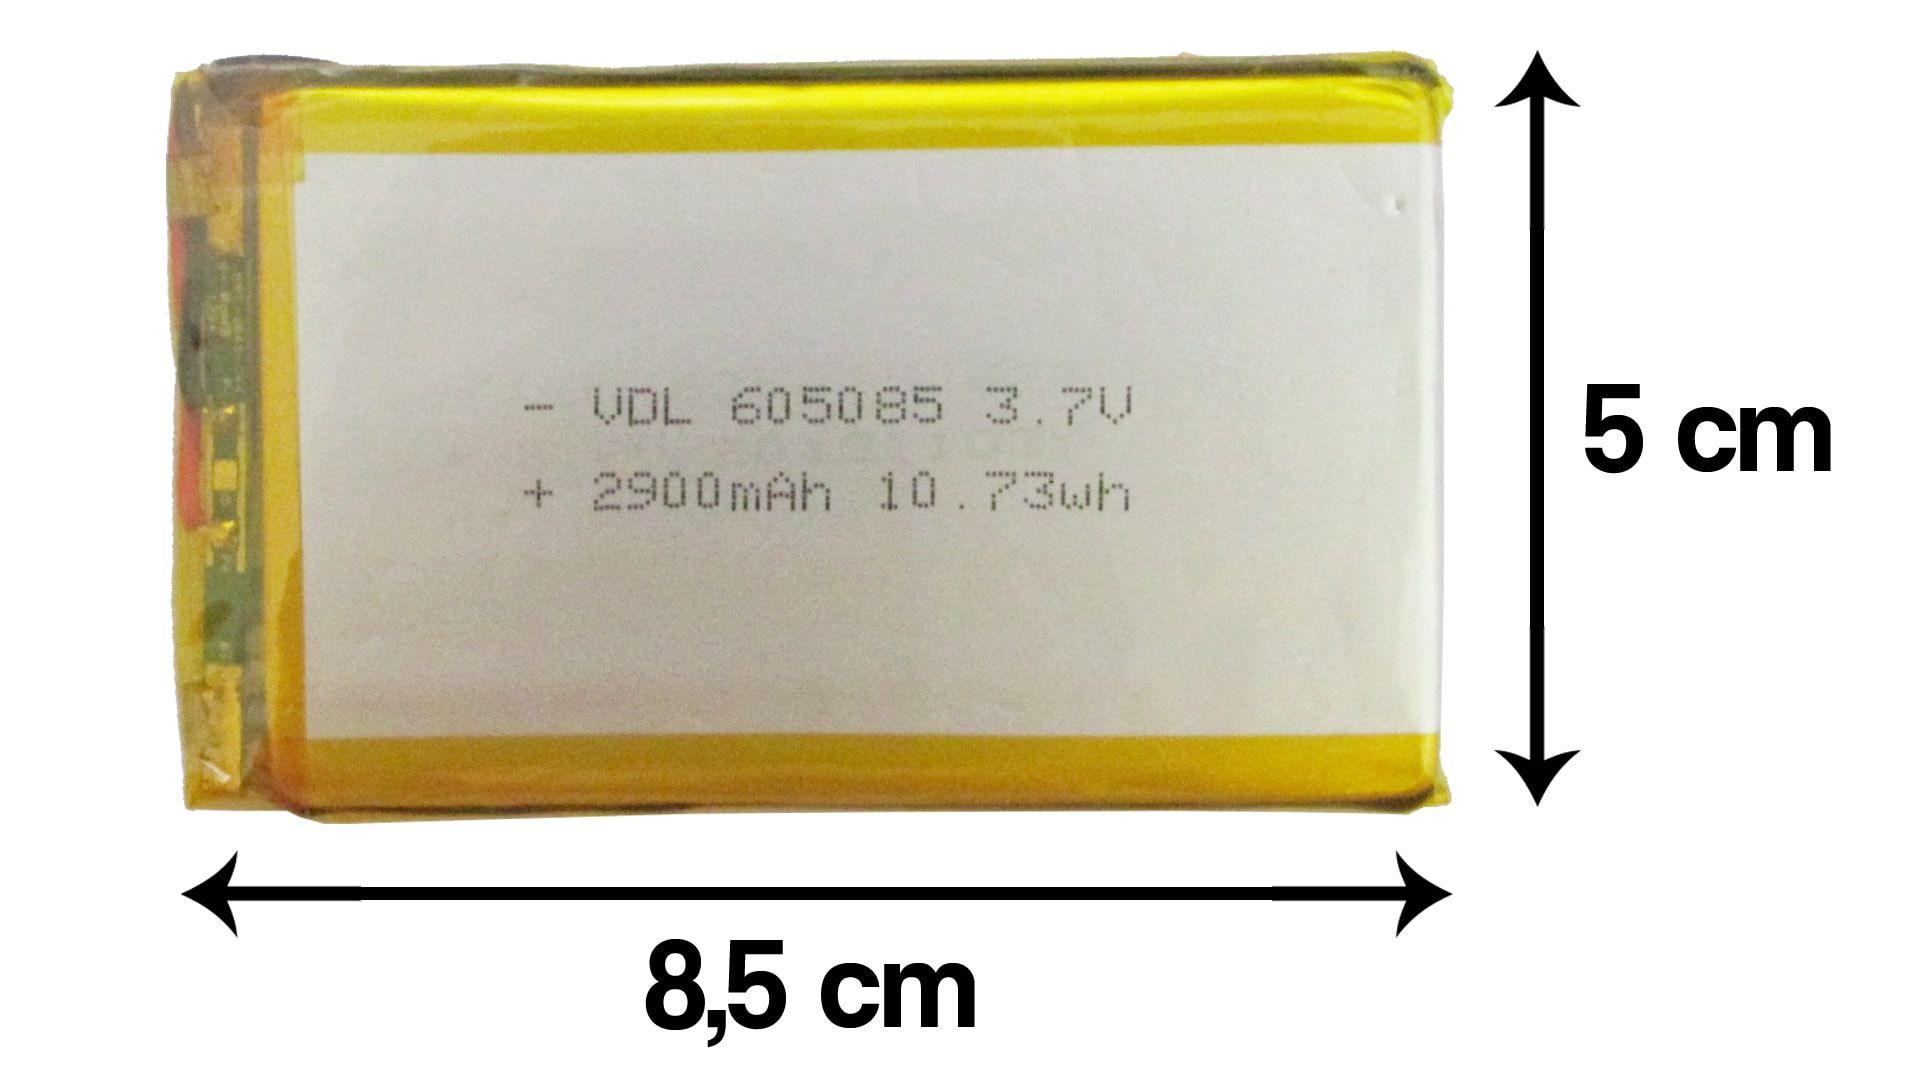 Bateria Universal Nova para Tablet 2900mah 3.7v Lithium